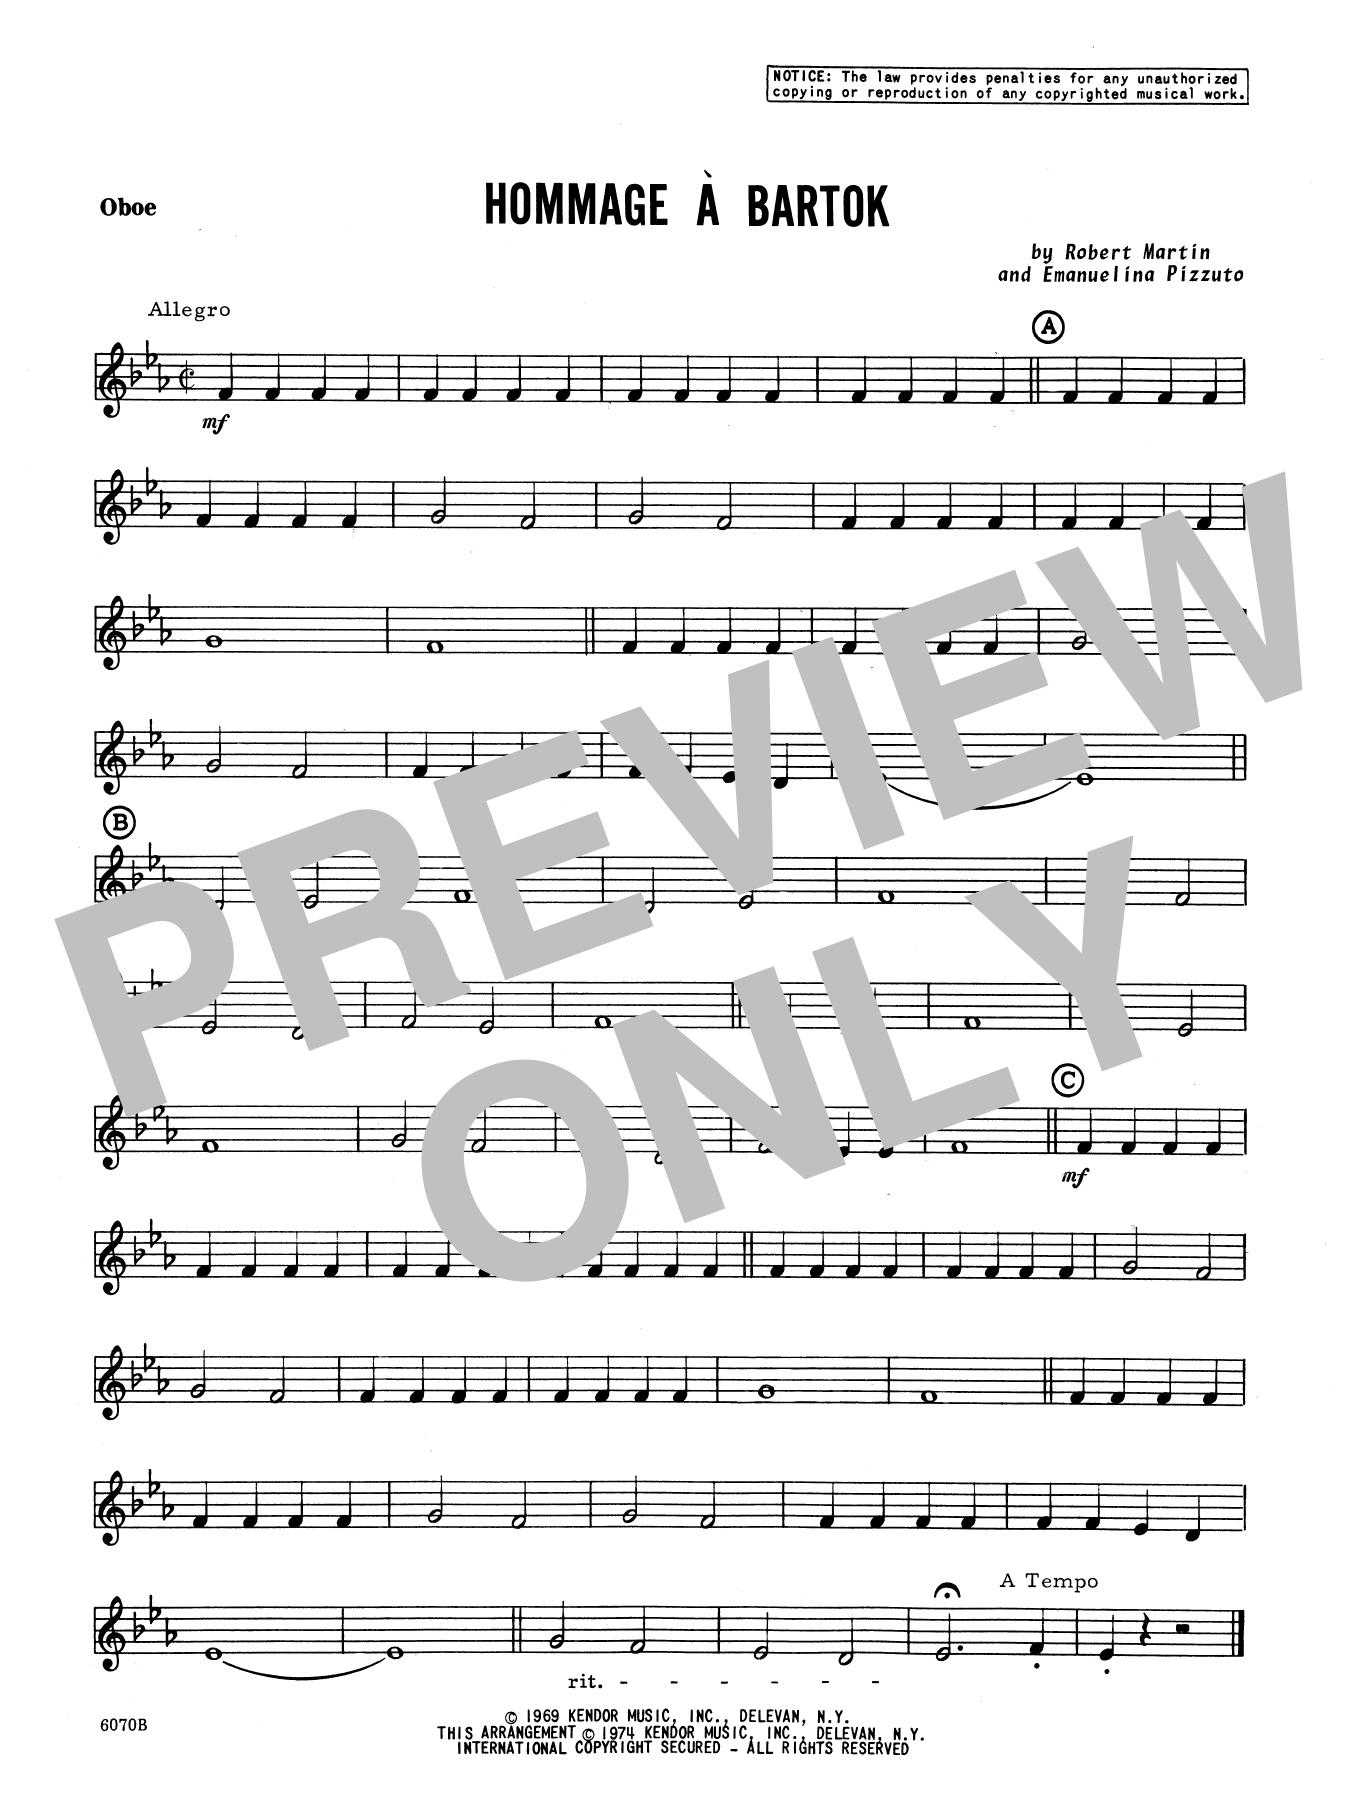 Hommage A Bartok - Oboe Sheet Music